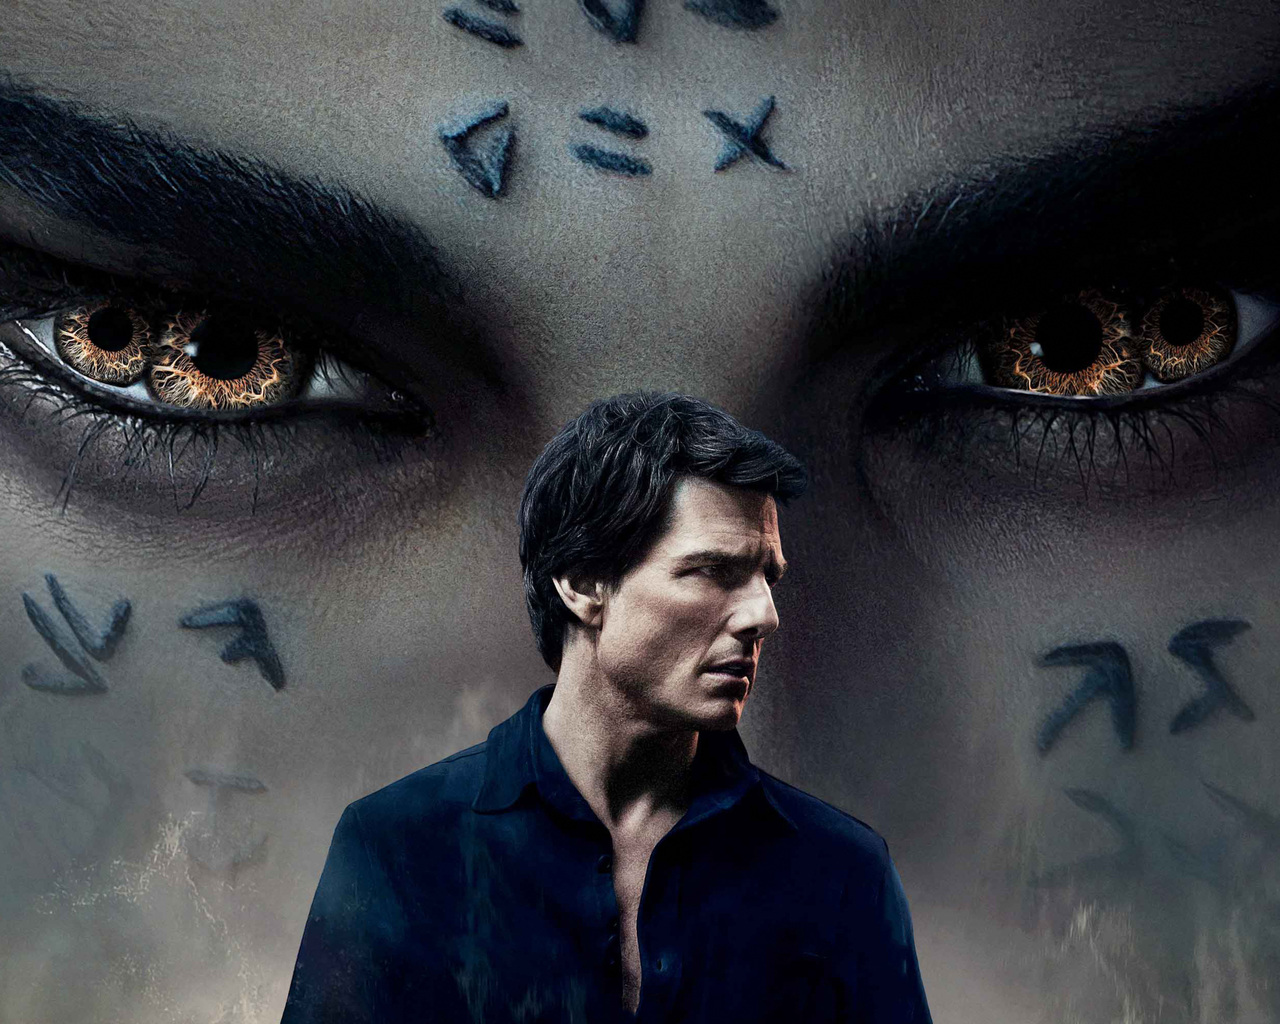 Wallpaper The Mummy 2017 Movies Hd Movies 4142: 1280x1024 The Mummy 2017 Tom Cruise 4k 1280x1024